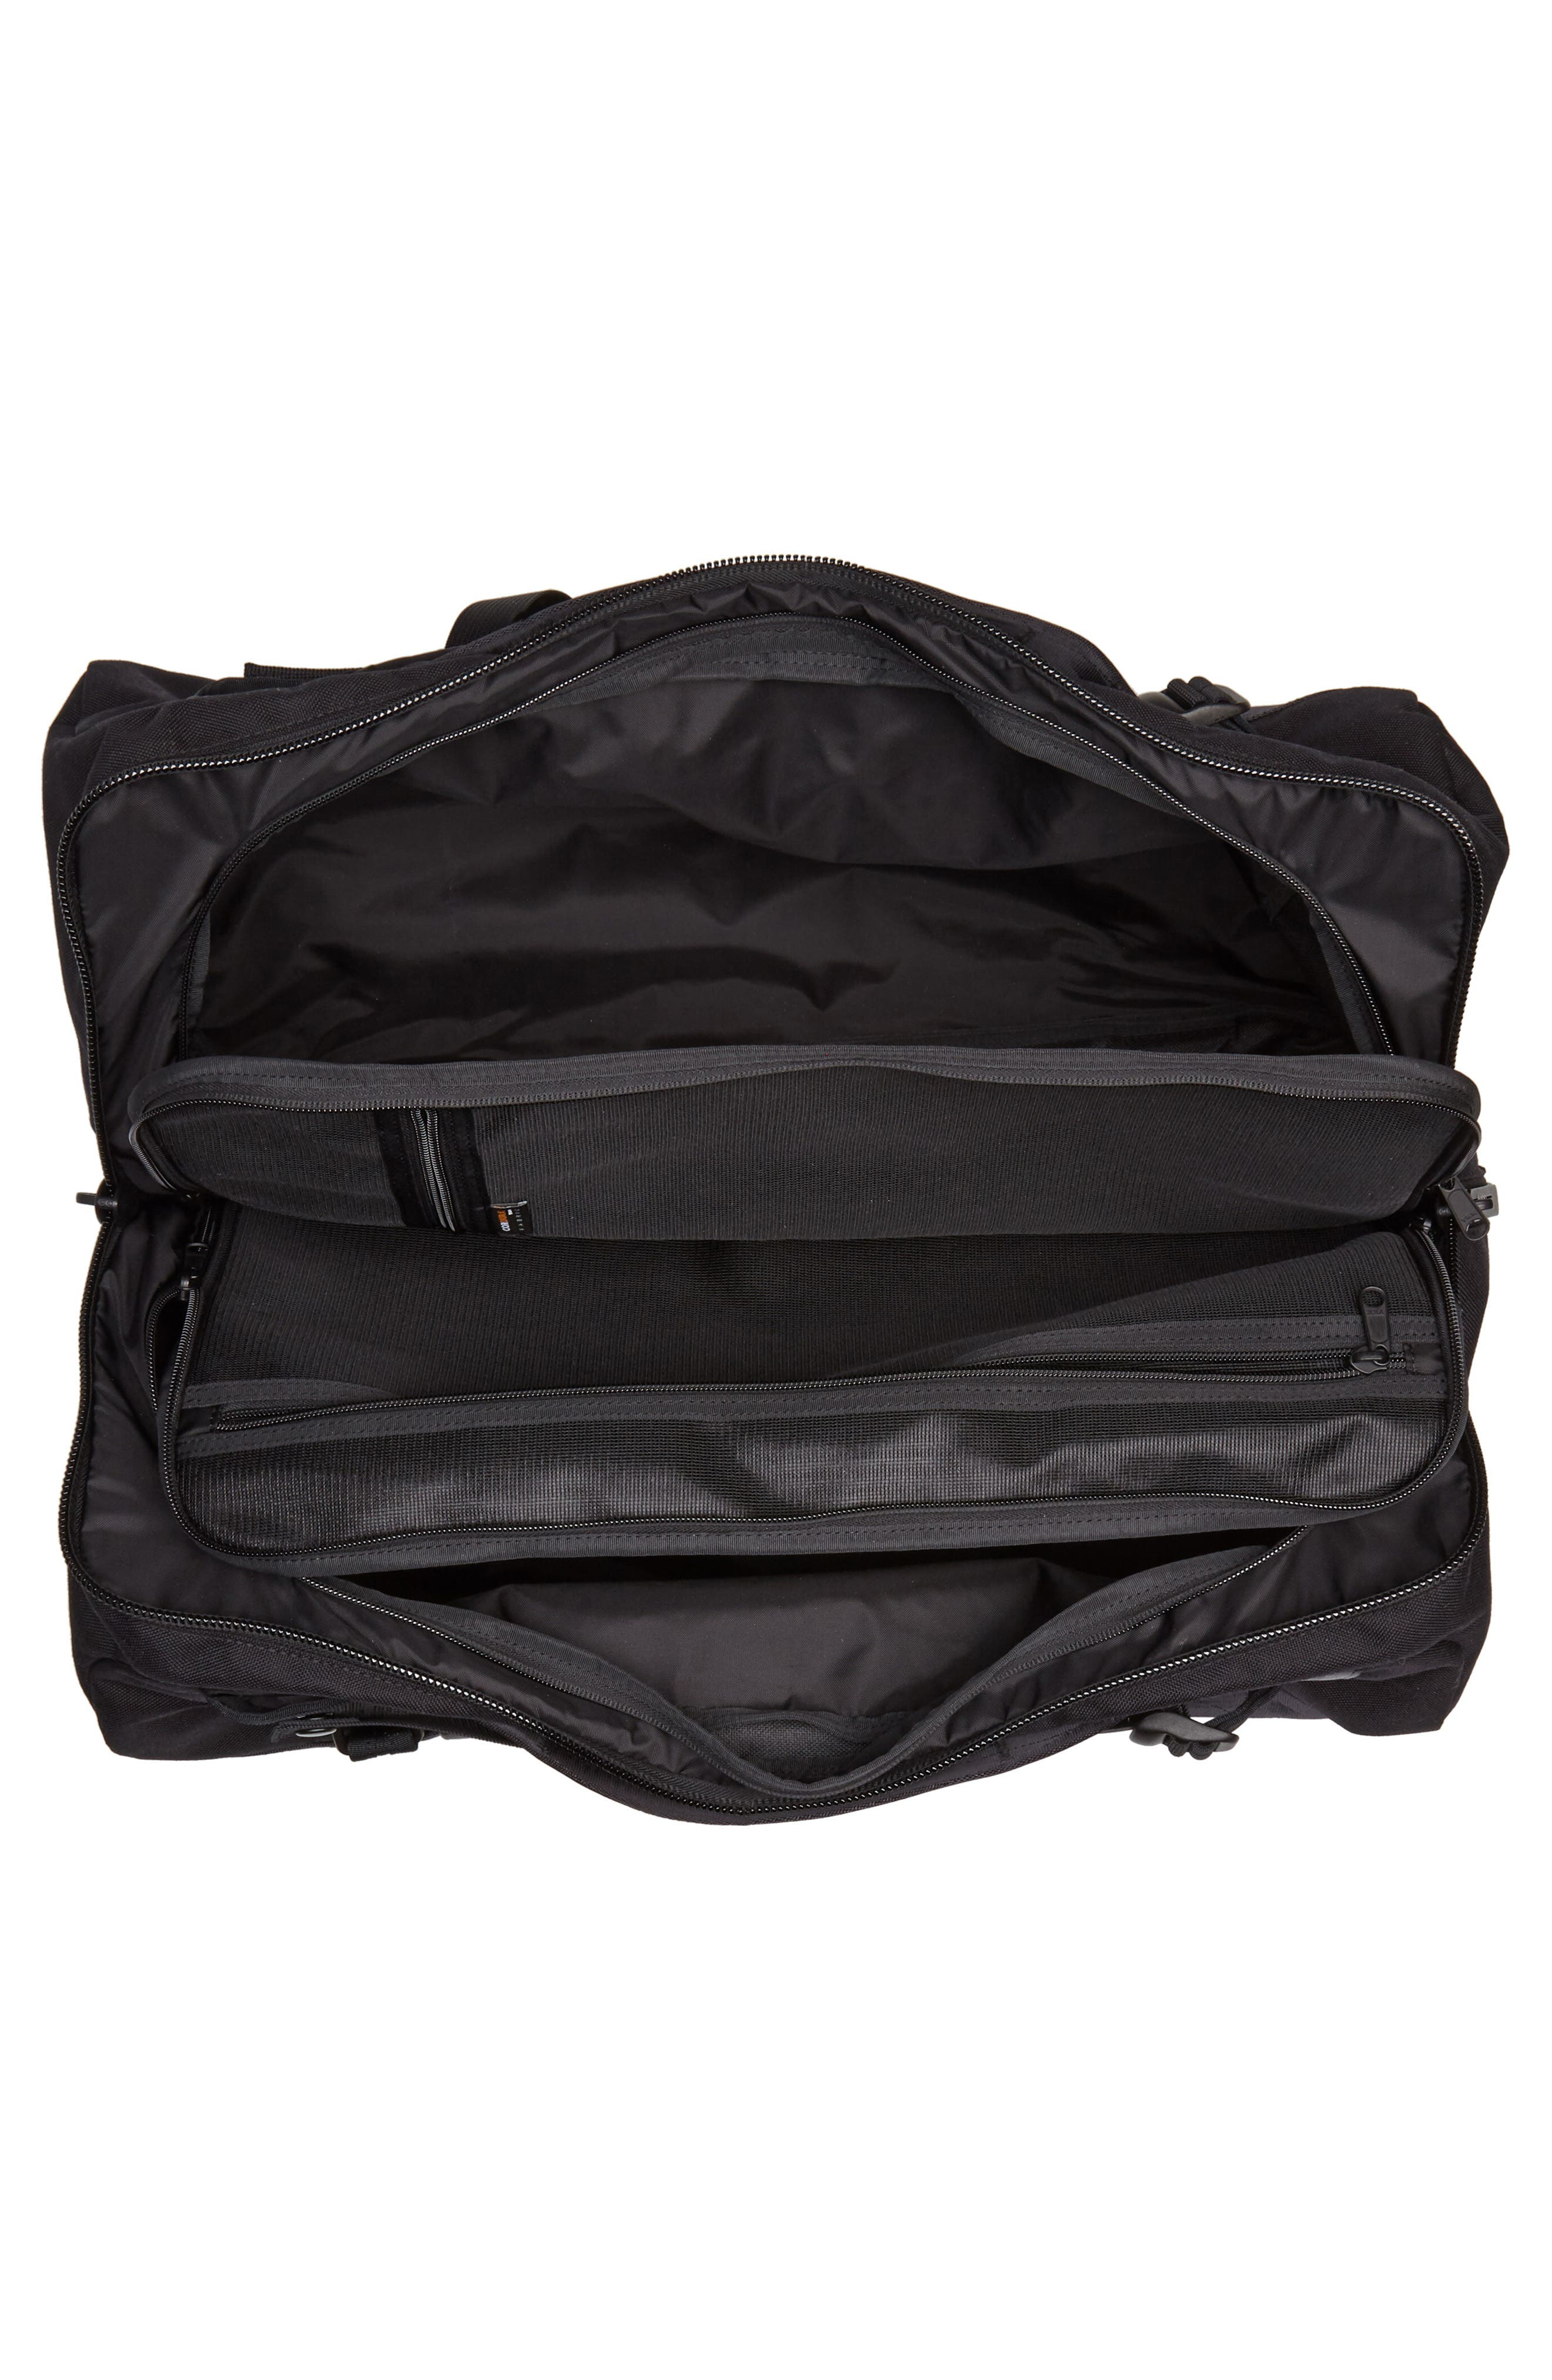 Porter-Yoshida & Co. Boothpack Convertible Duffel Bag,                             Alternate thumbnail 5, color,                             BLACK